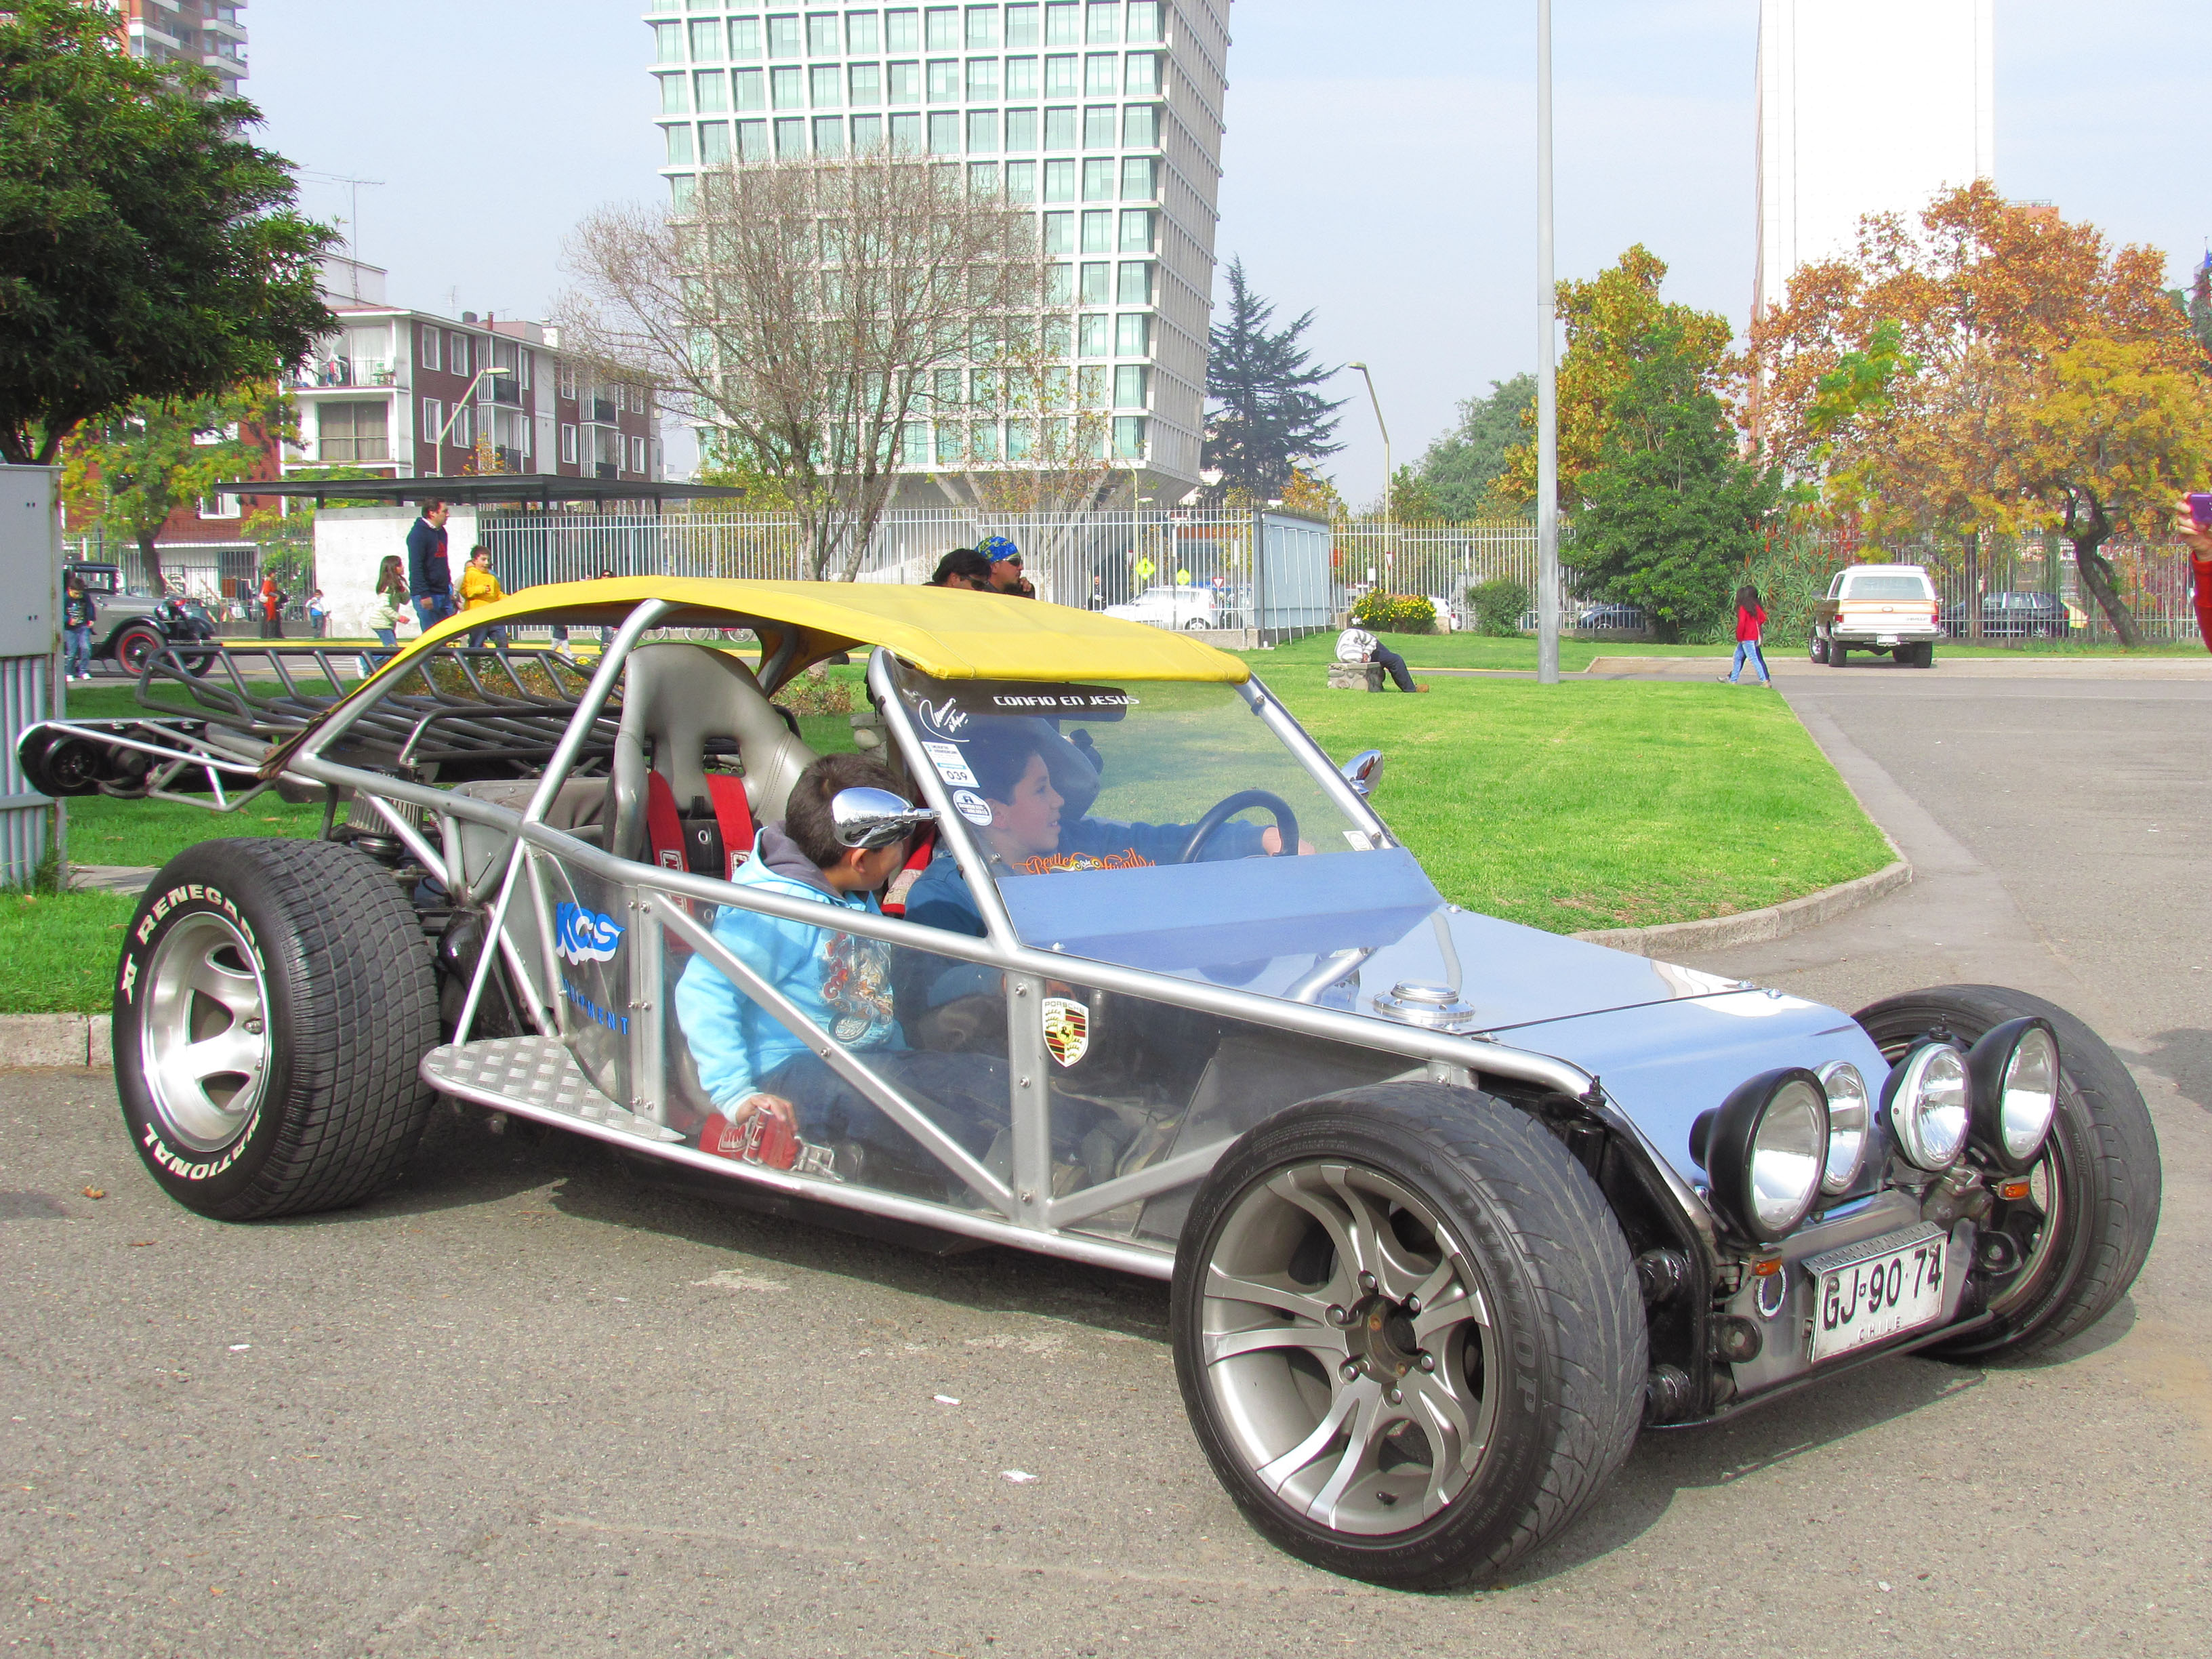 Steel Framed Cars : Wiki space frame upcscavenger